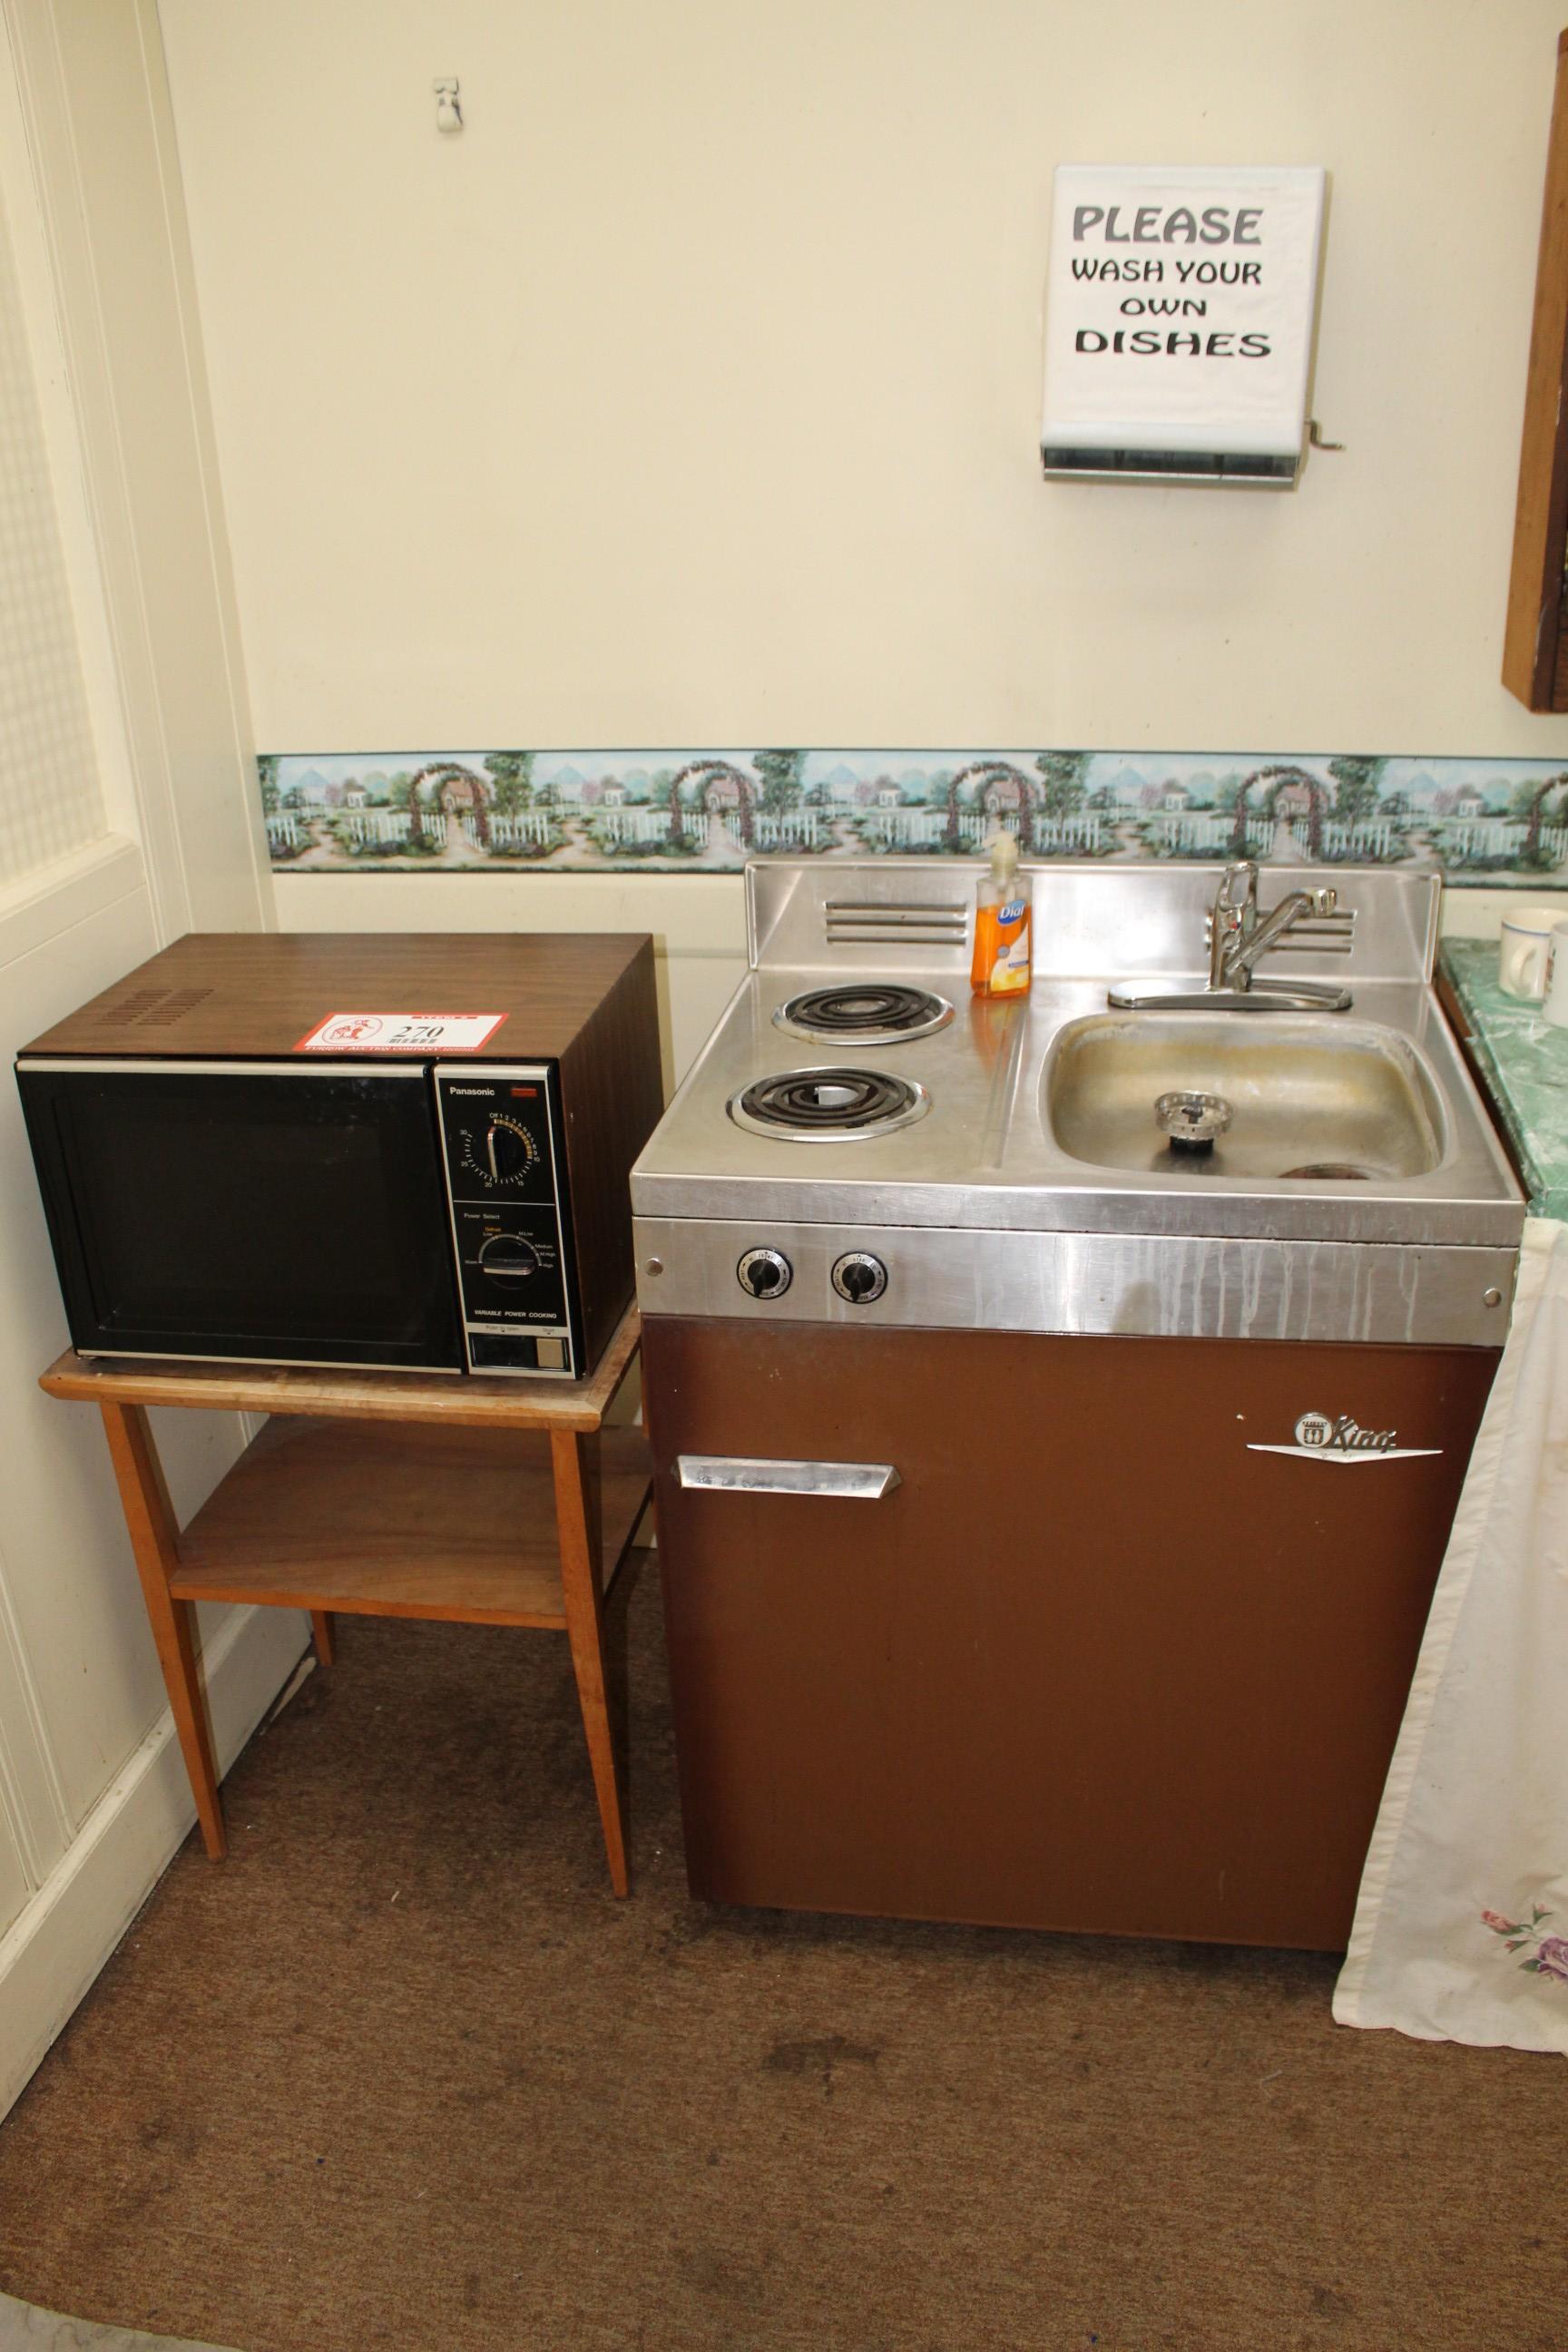 Lot 270 - Panasonic Microwave Oven & a King Refrigerator/Stove/Sink Combo